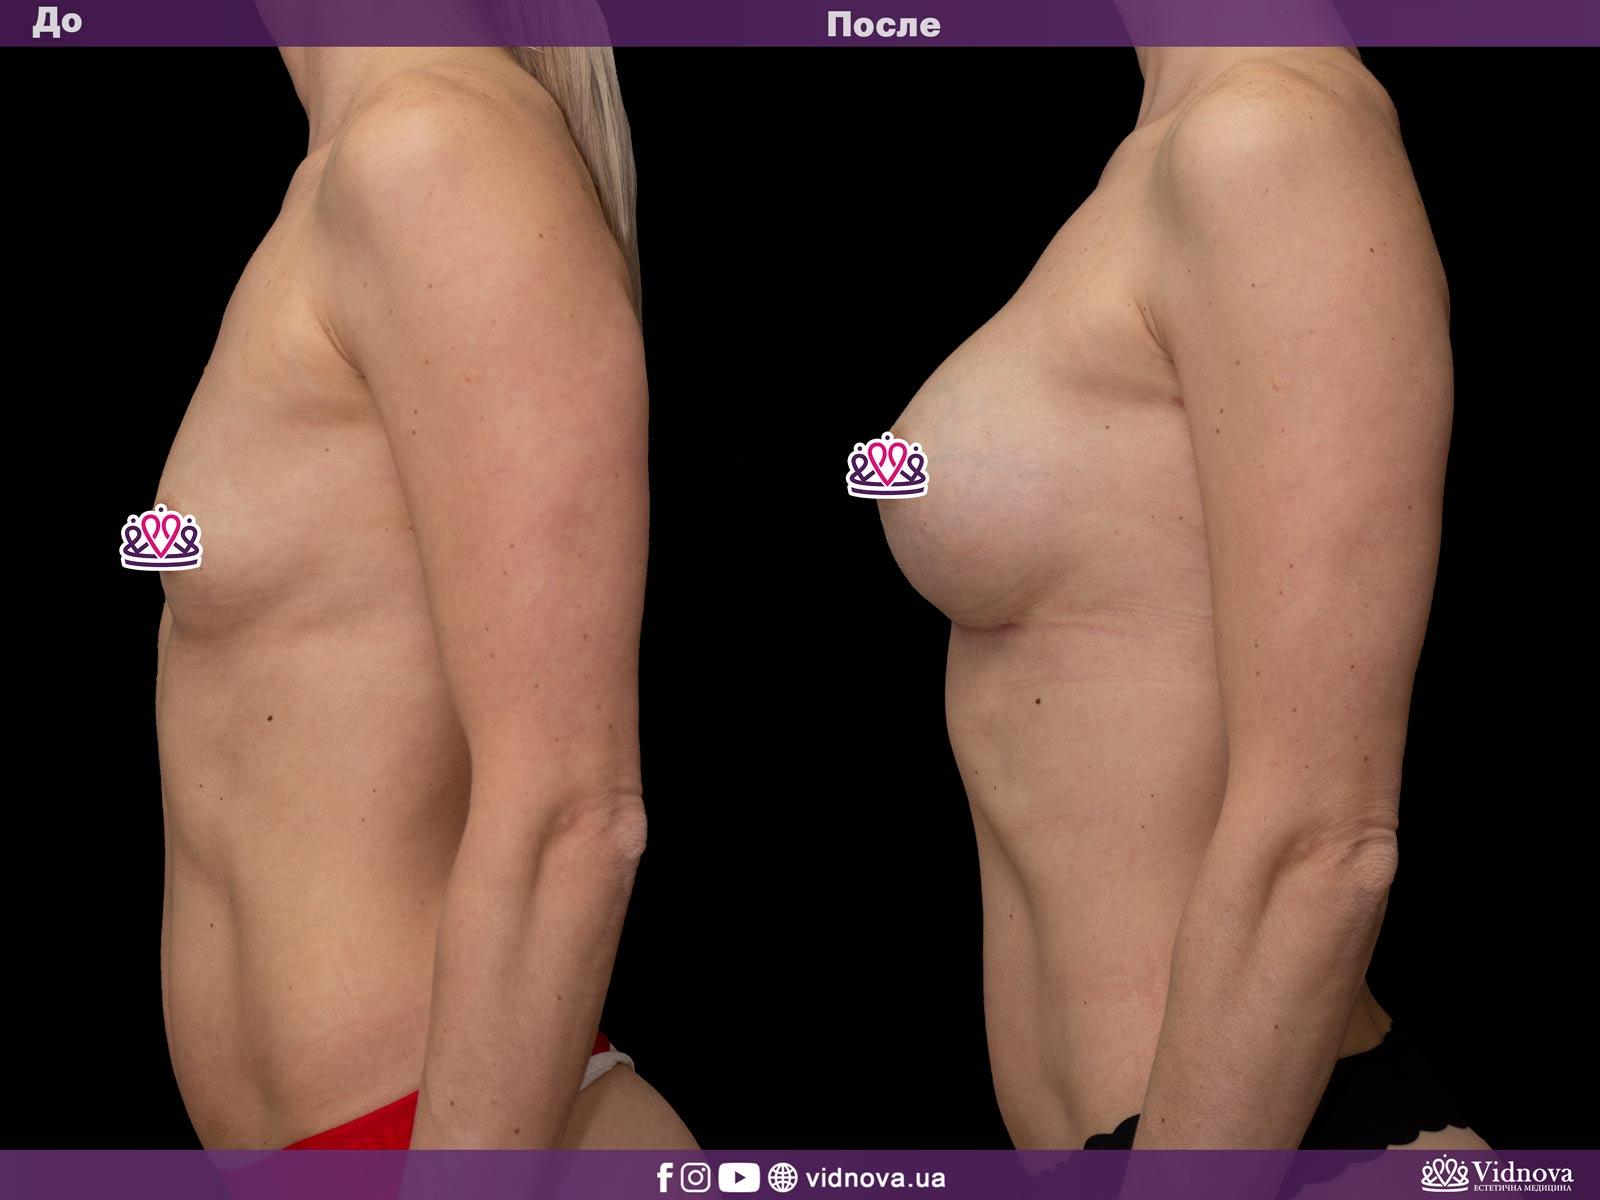 Увеличение груди: Фото ДО и ПОСЛЕ - Пример №16-3 - Клиника Vidnova